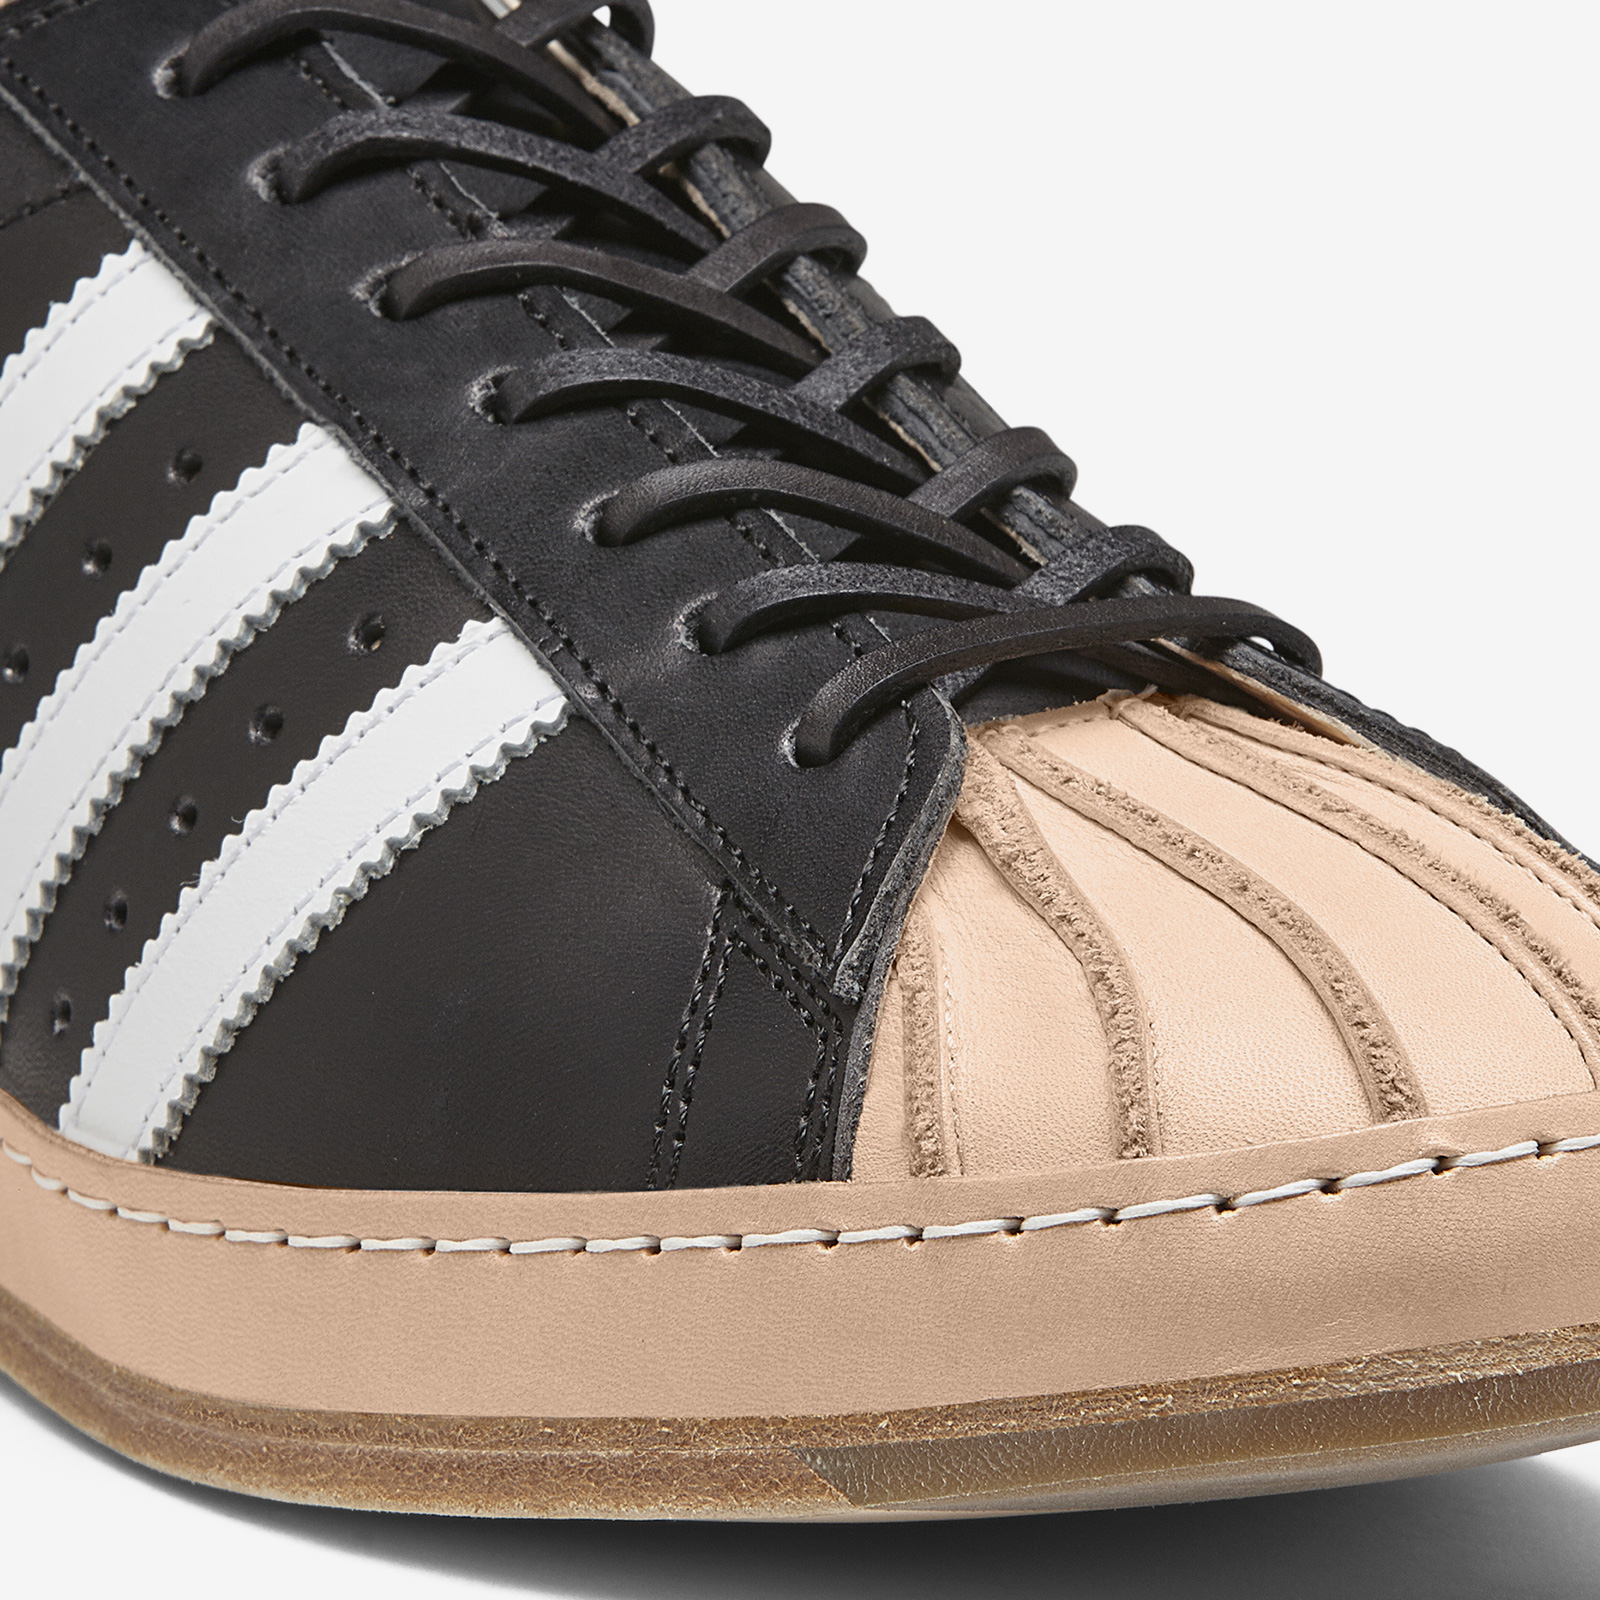 newest 78b0c 8a209 ... adidas Consortium Hender Scheme Superstar ...